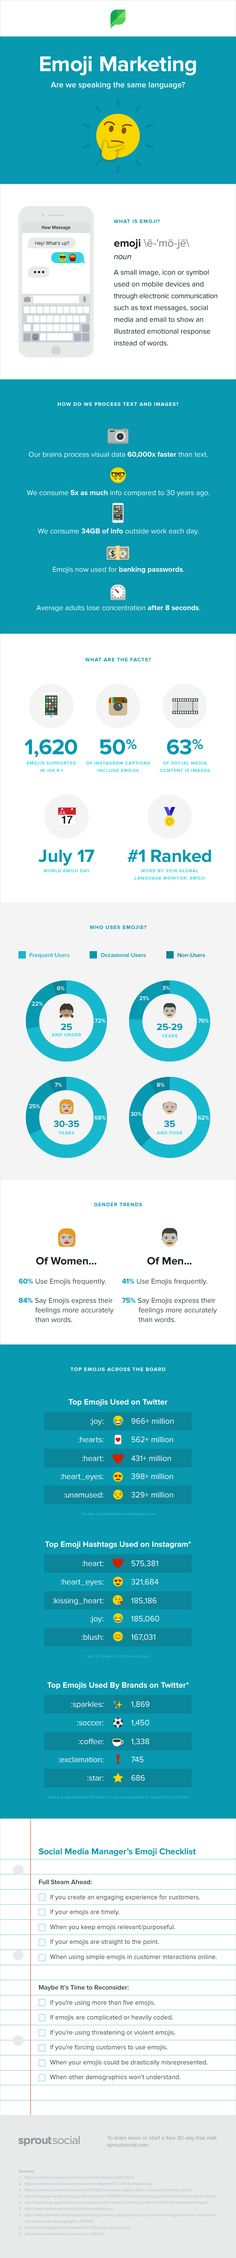 Emoji Marketing: 11 Step Checklist for Using Emojis on Social Media #Infographic